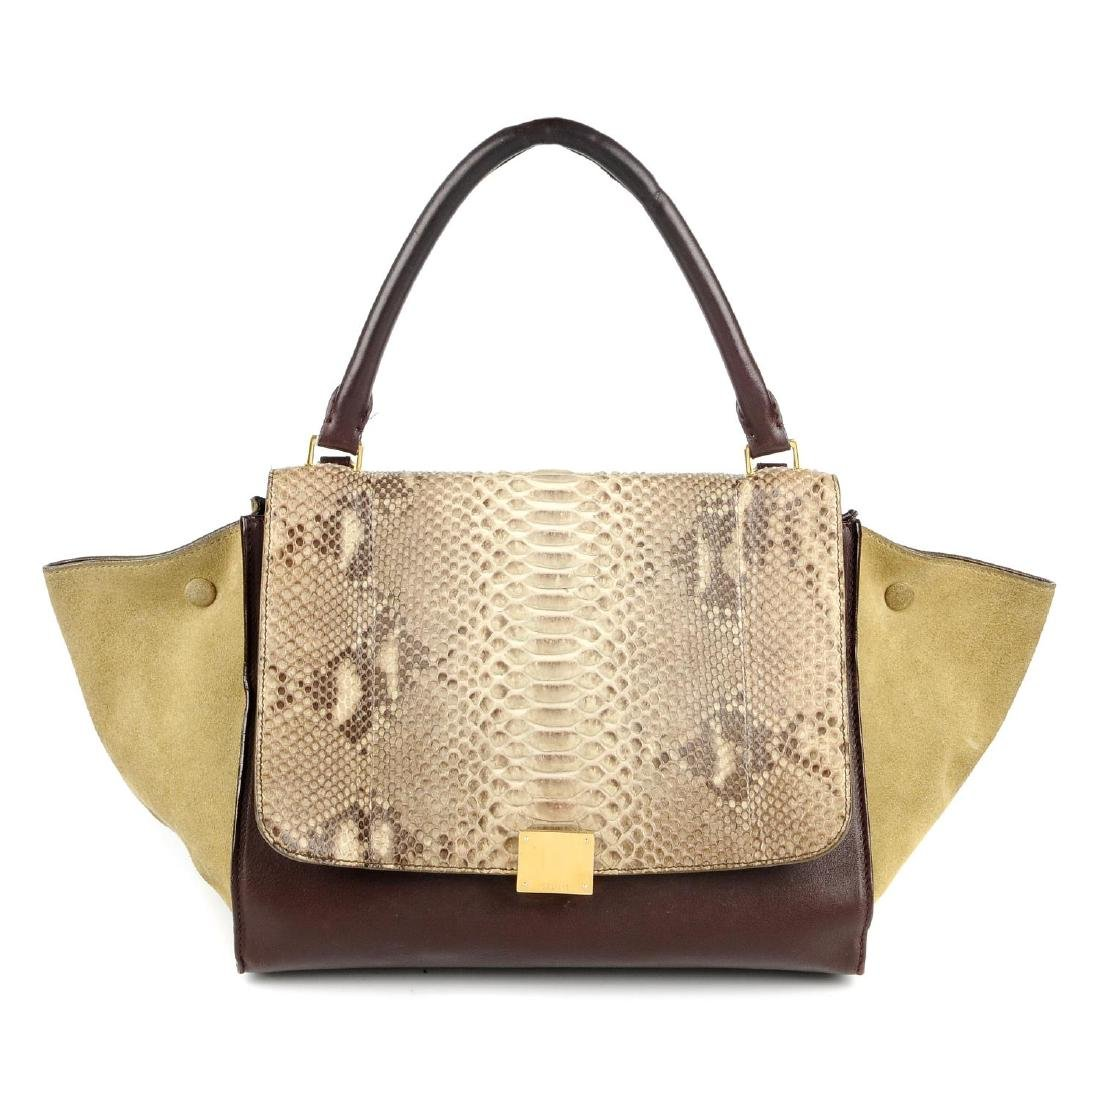 CÉLINE - a python skin trapeze handbag. Crafted from